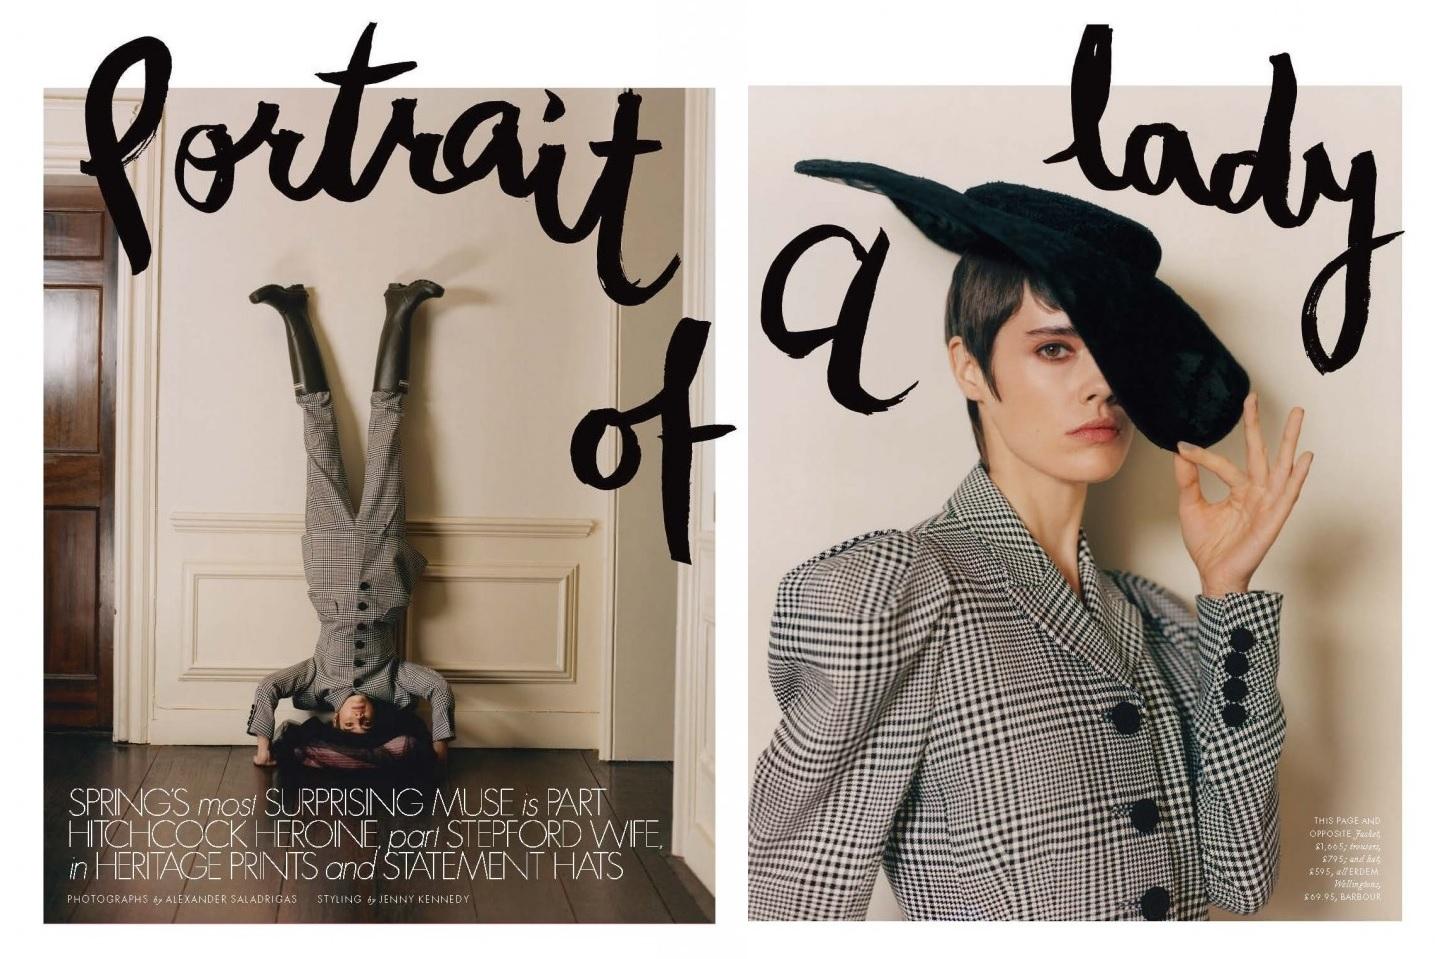 Taja Feistner by Alexander Saladrigas for British Elle (1).jpg